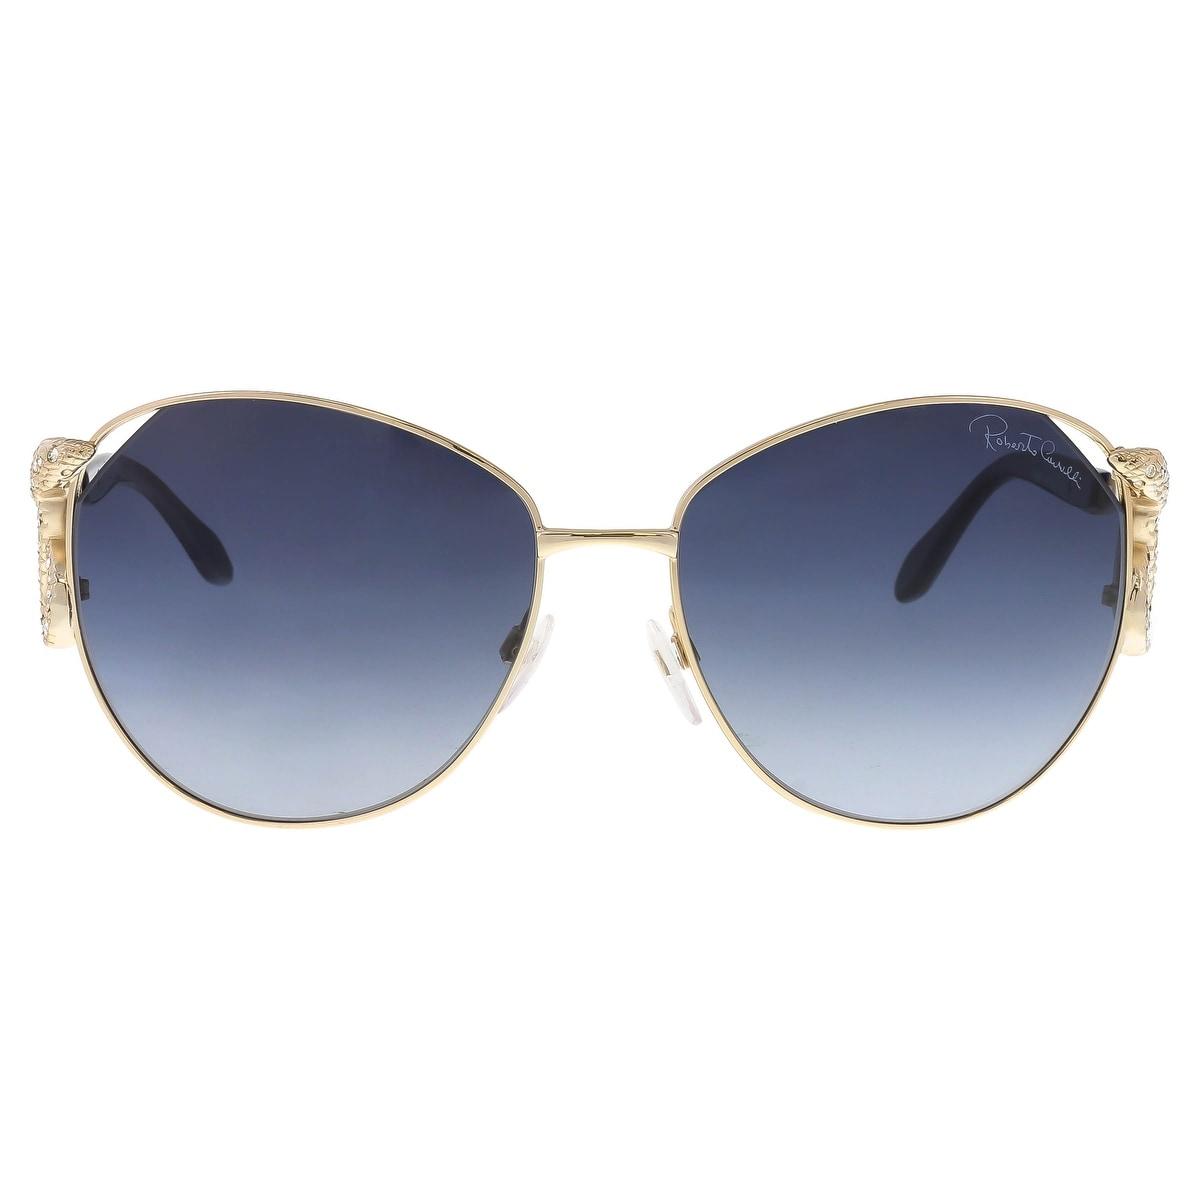 c1f2429d26e8c Shop Roberto Cavalli RC897 S 28W Hatysa Gold Navy Round Sunglasses -  60-16-135 - Free Shipping Today - Overstock - 19757018